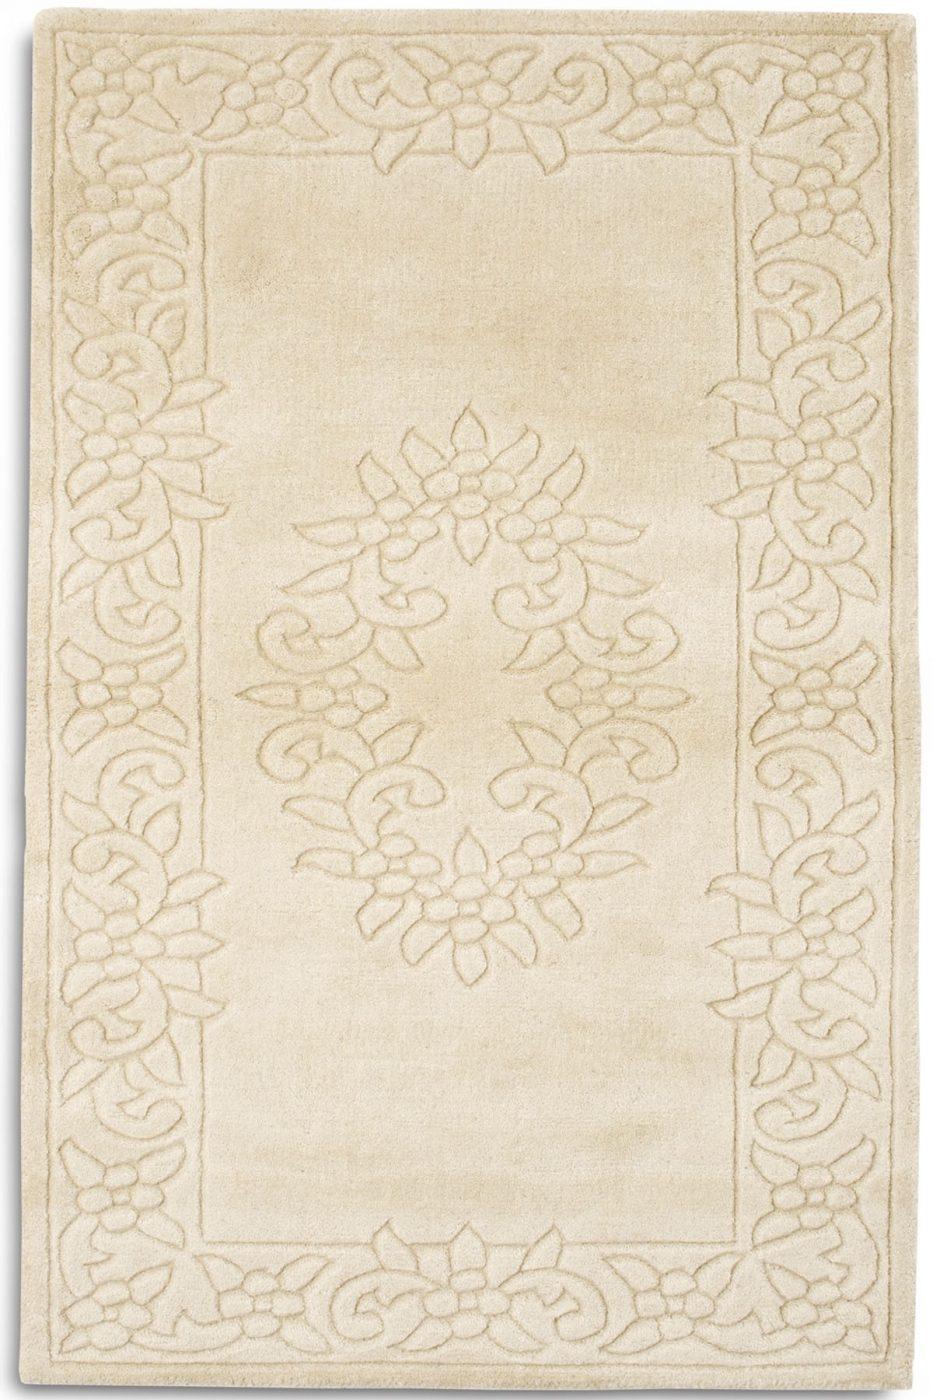 Royale ROY08 | Plantation Rug Company | Best at Flooring